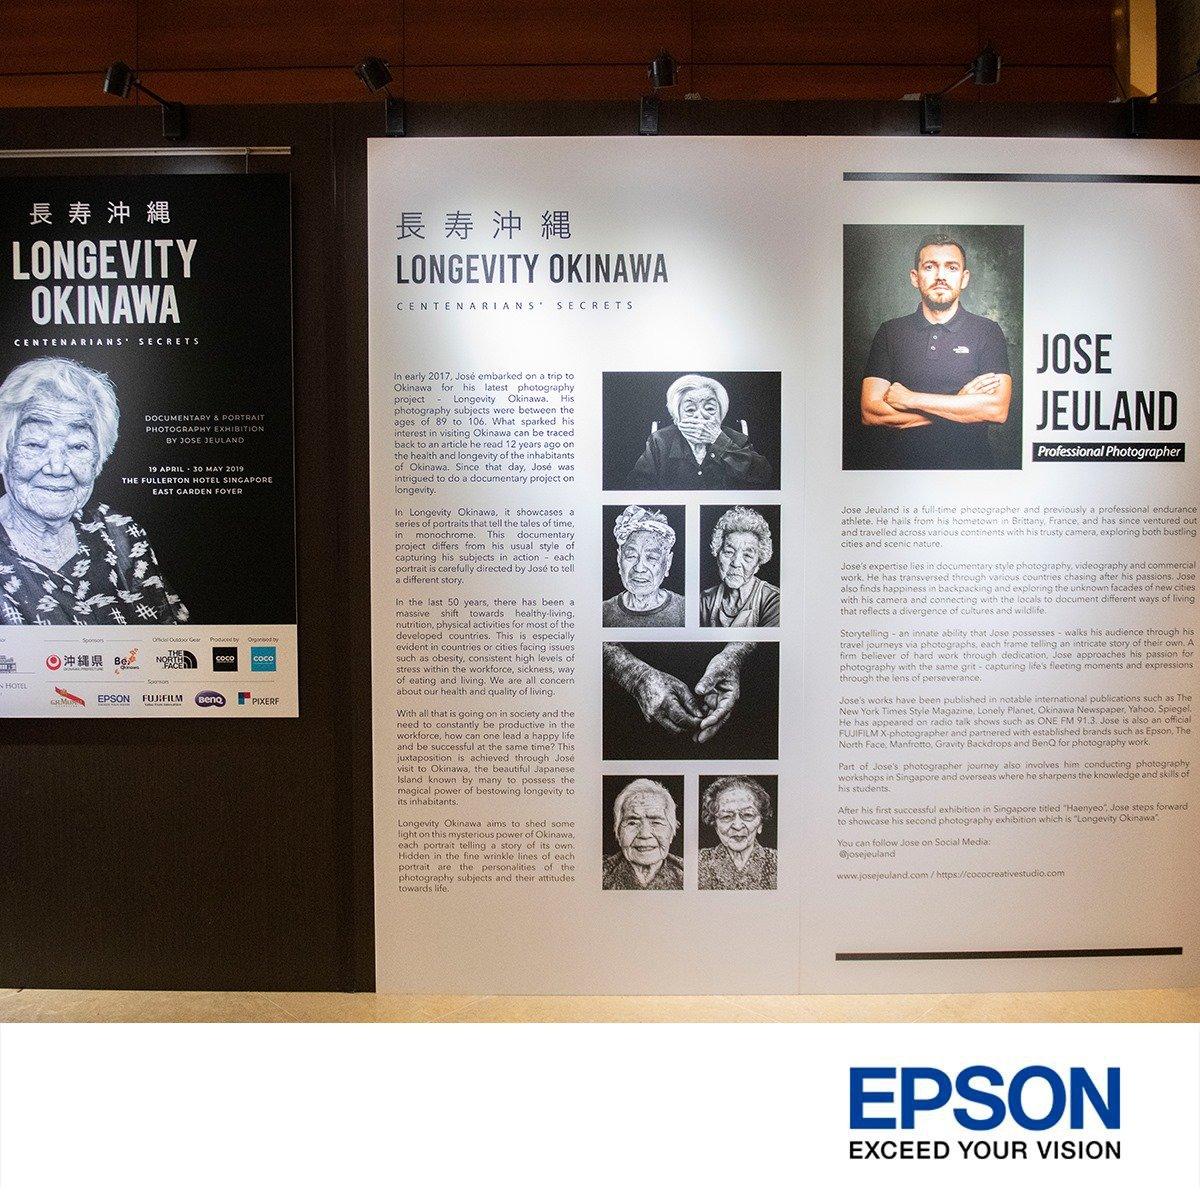 Epson printer photography exhibition singapore Jose Jeuland Photographer